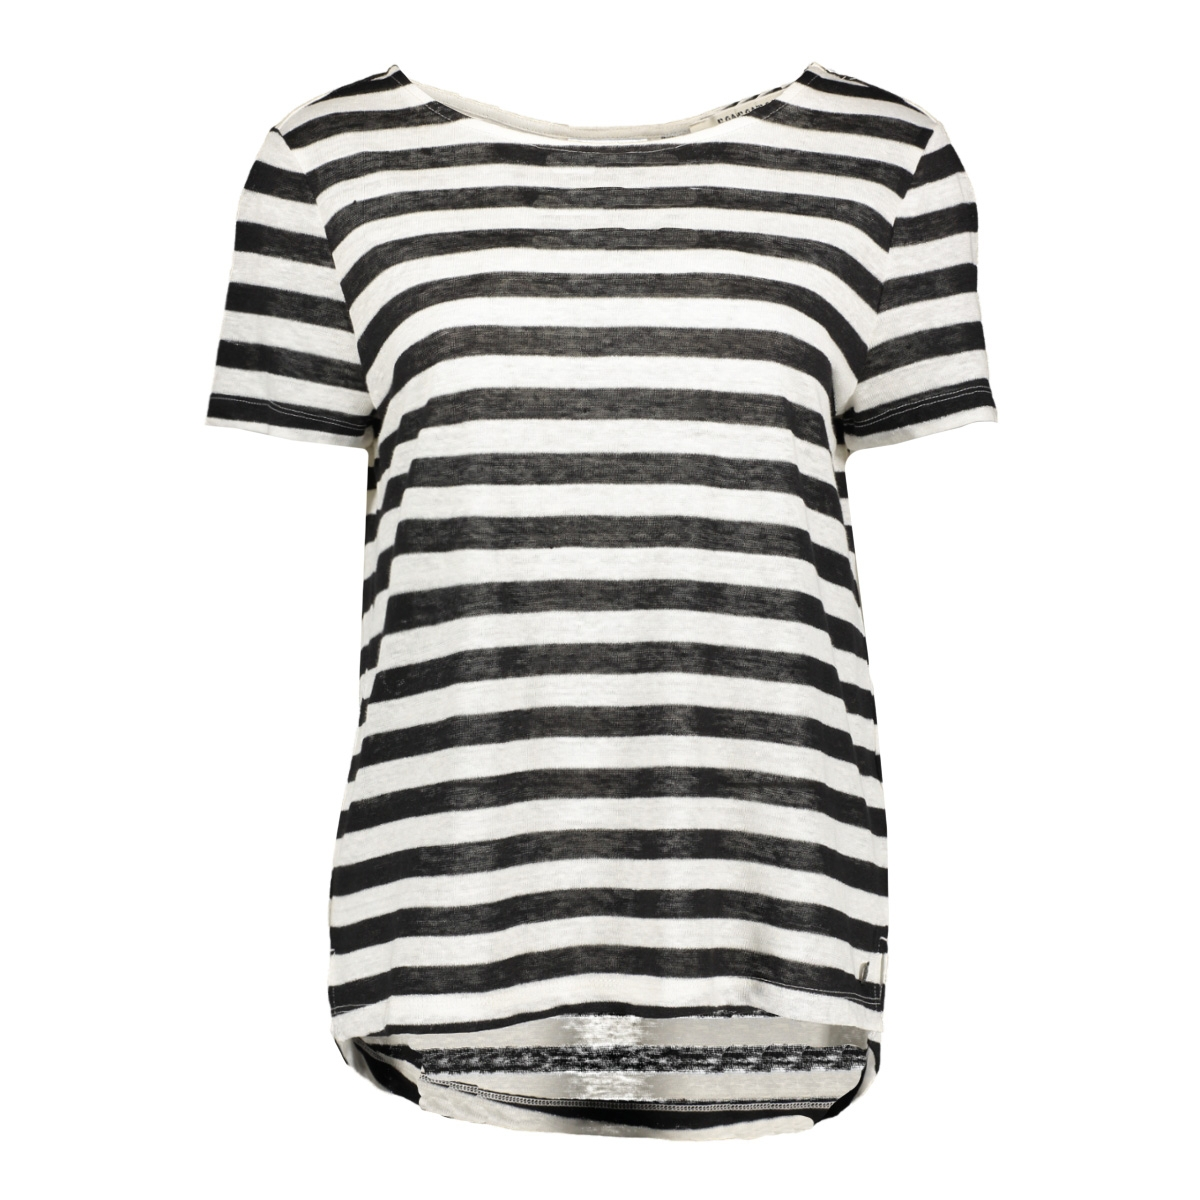 gs900305 garcia t-shirt 60 black